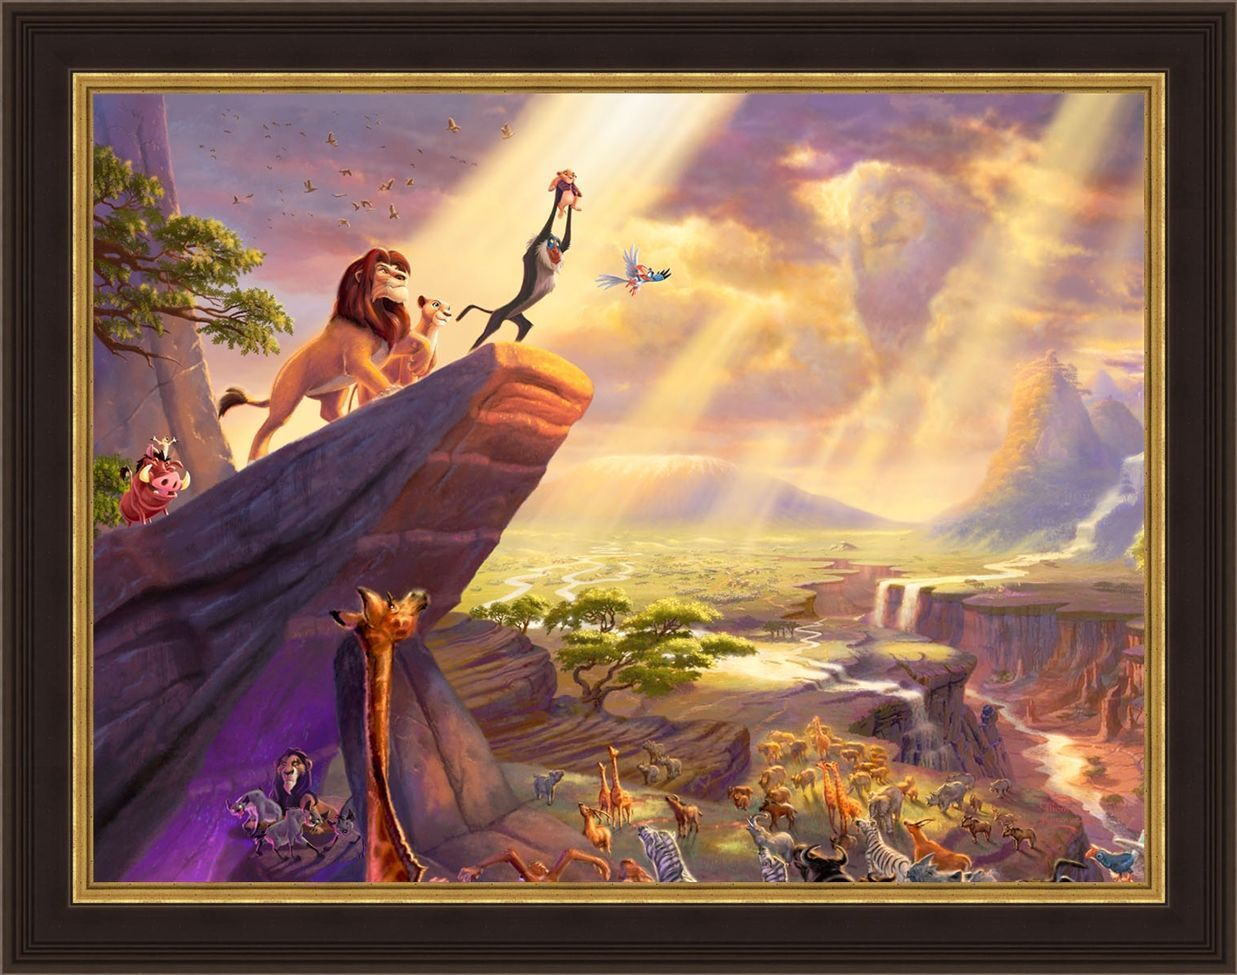 The Lion King Thomas Kinkade Framed Wall Art   The Lion King ...